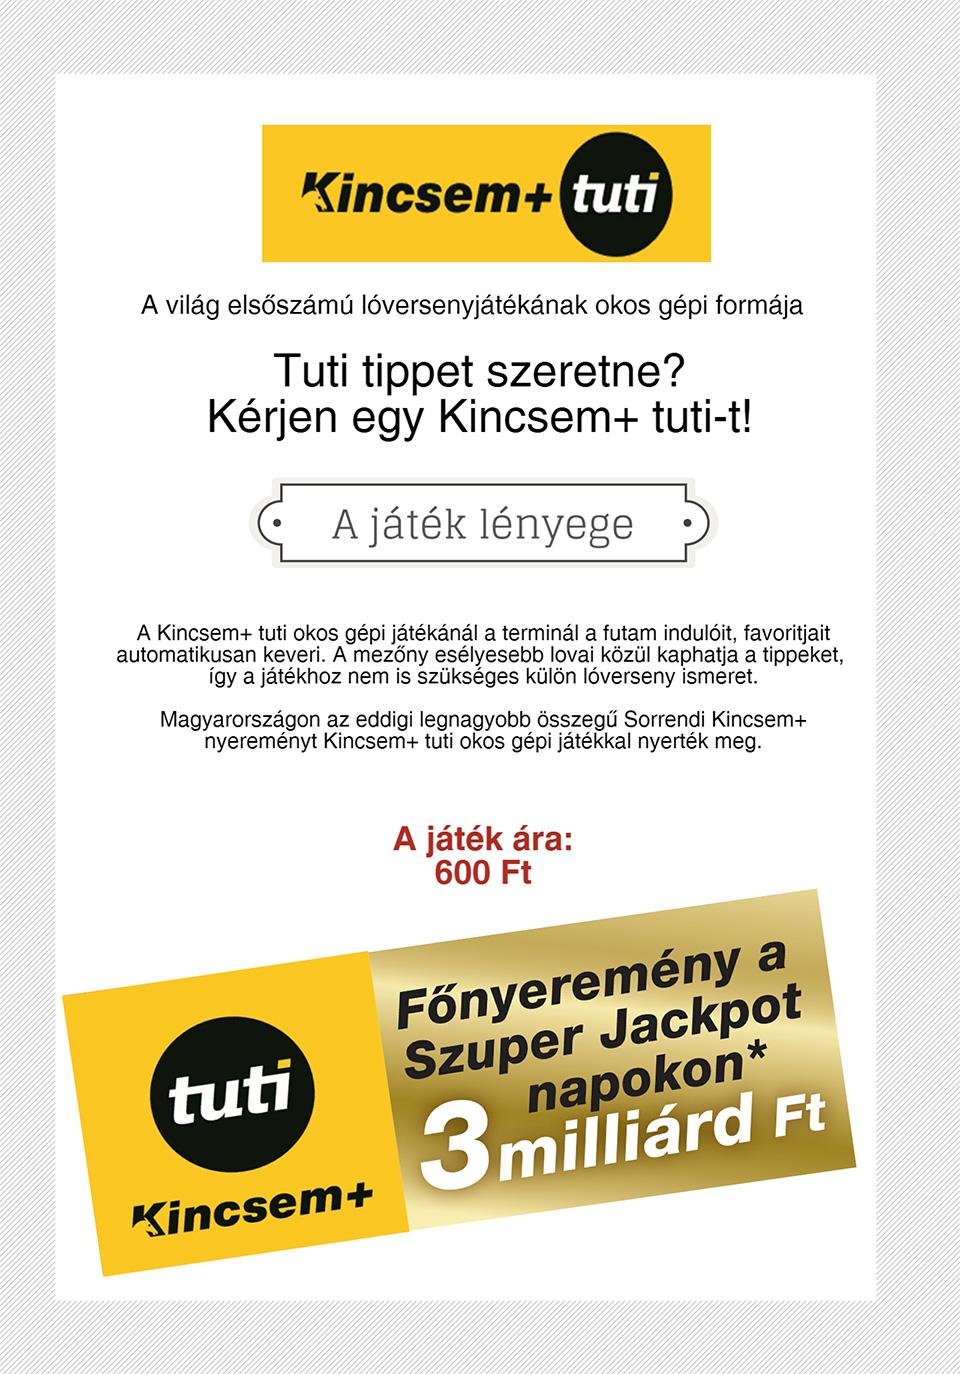 kincsem-5c-tuti_sarga_logo_jatekleiras2